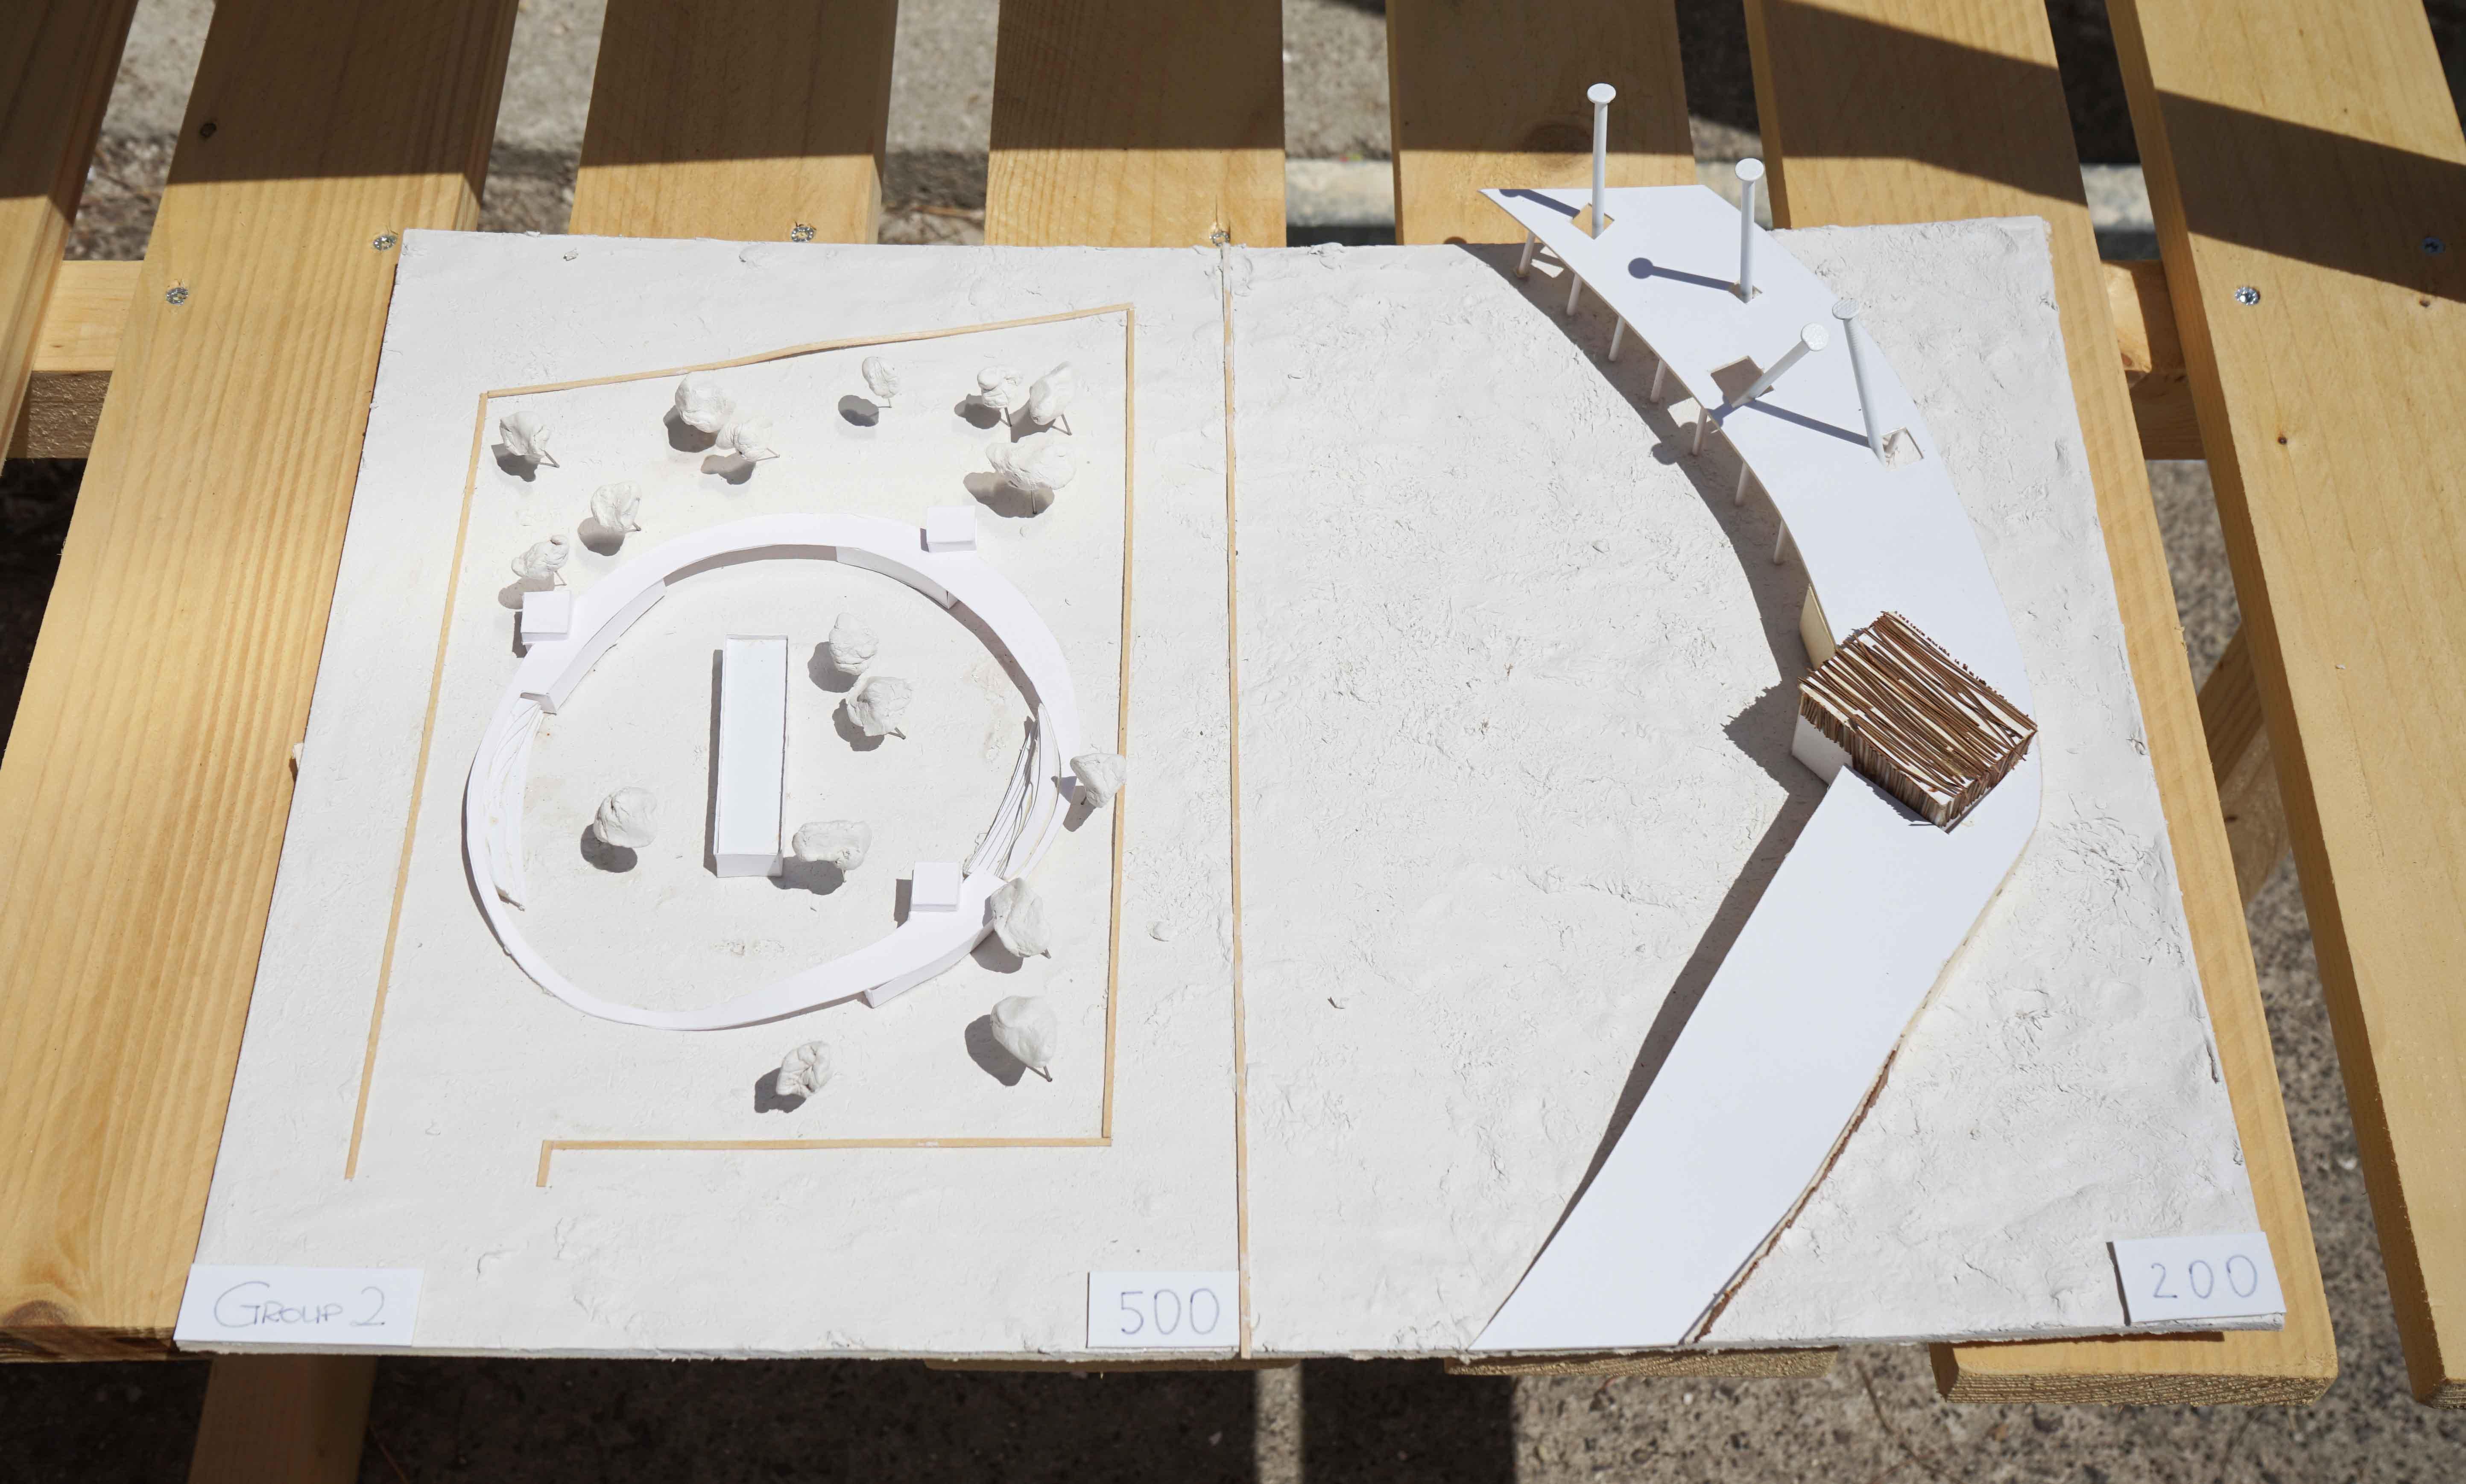 IAHsummer2019 - wooden ellipse